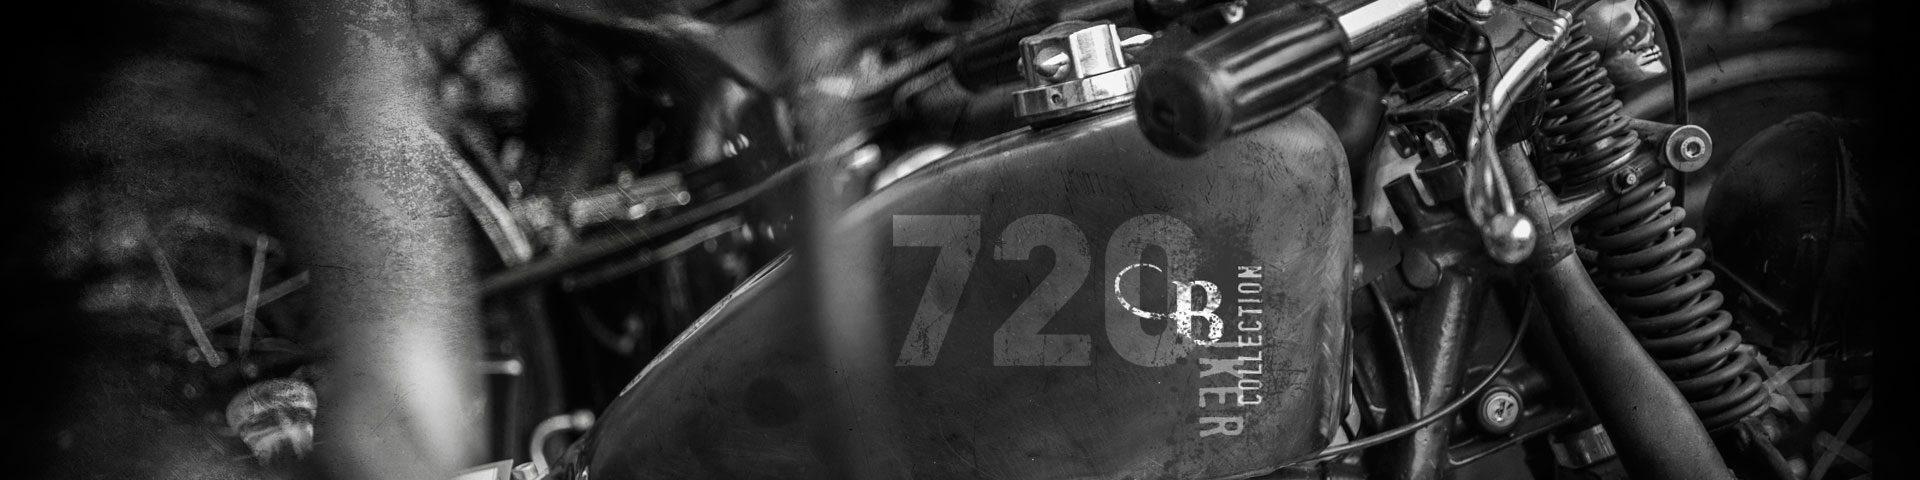 720_pic_biker